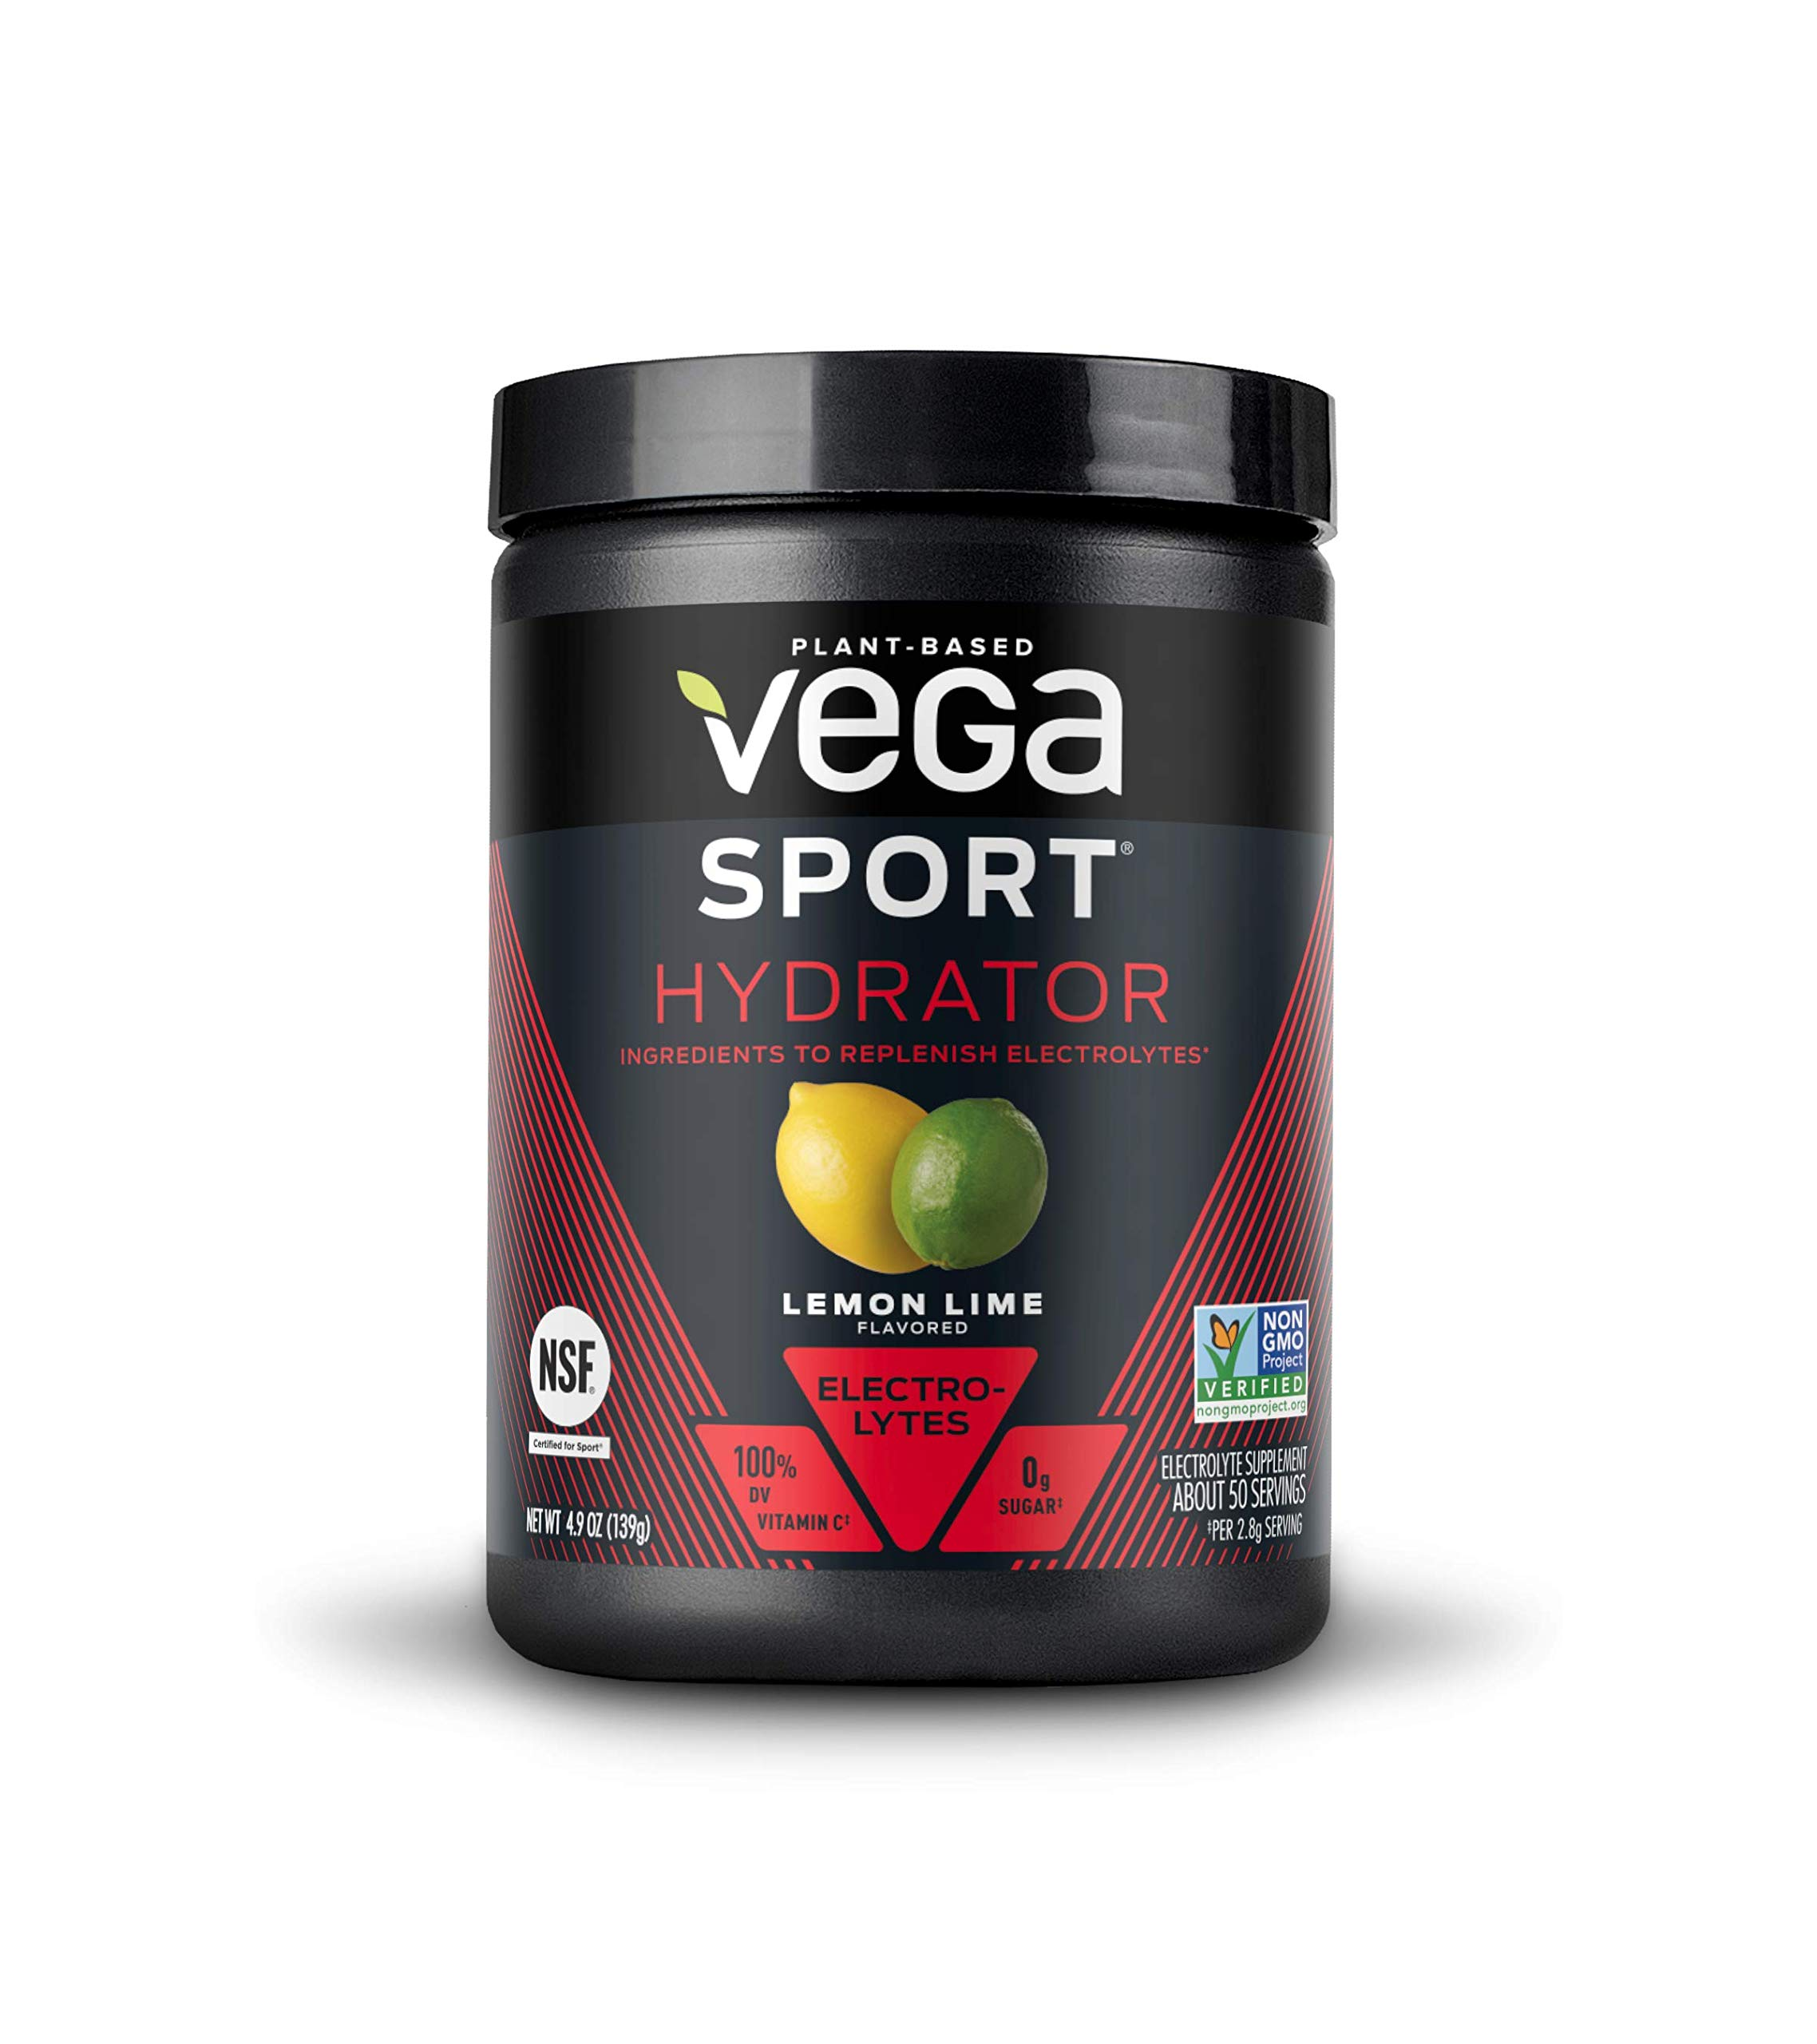 New Vega Sport Hydrator Lemon Lime (50 Servings, 4.9 oz Tub) - Electrolyte Powder, Gluten Free, Non Dairy, Vegan, Sugar Free, Keto Friendly, Non GMO (Packaging May Vary) by VEGA